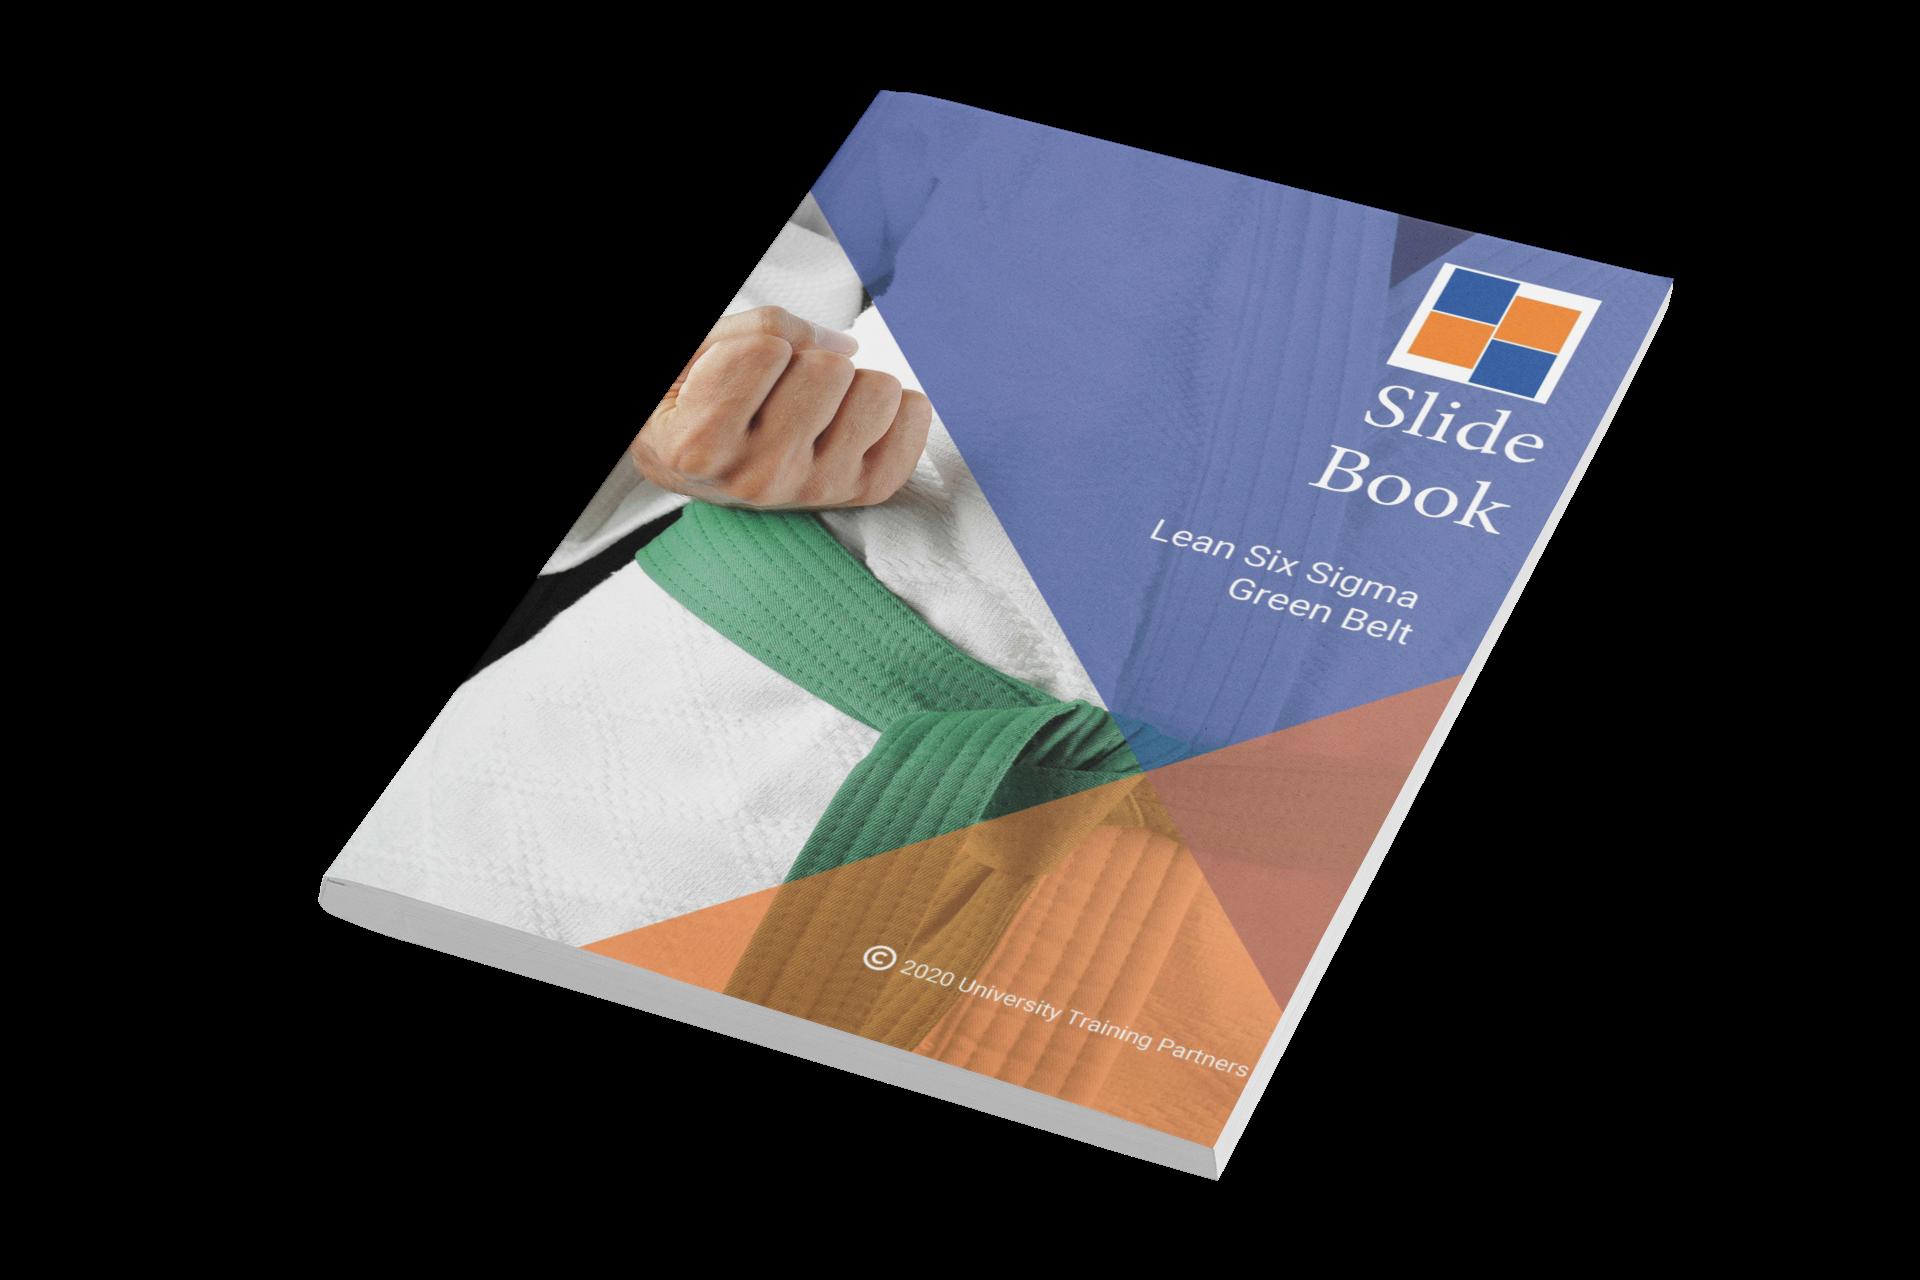 Lean Six Sigma Green Belt Slide Book